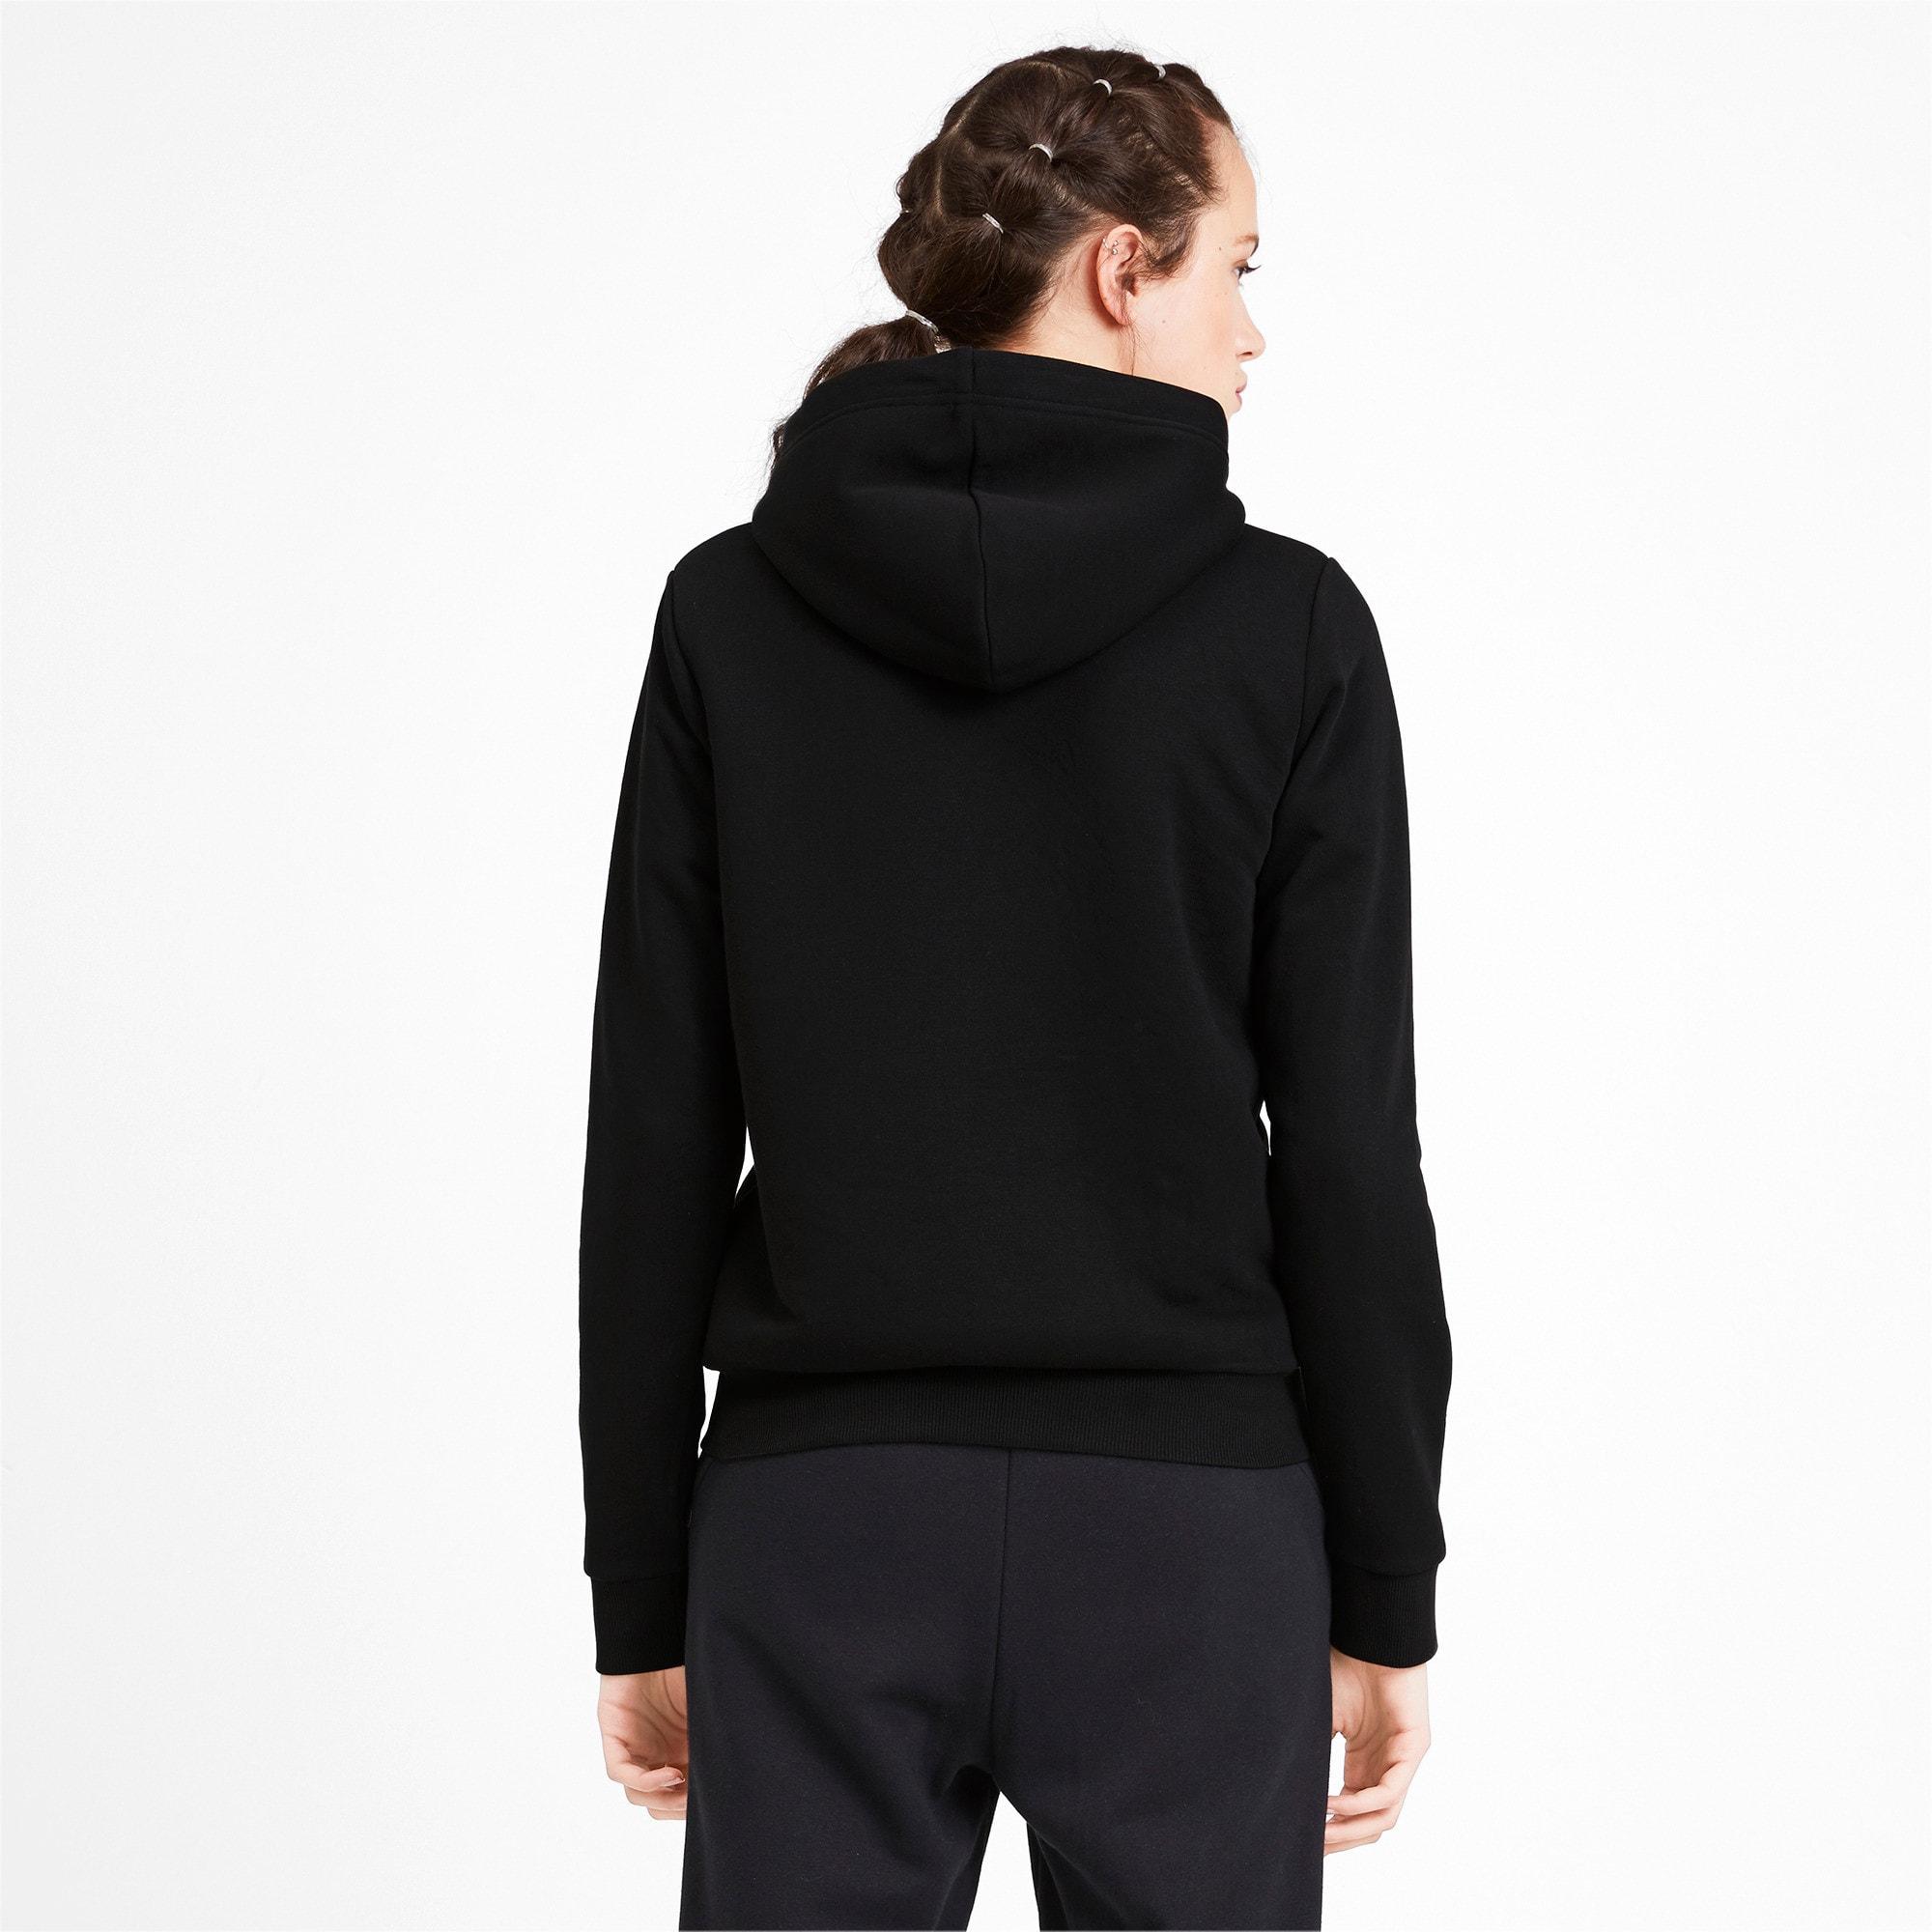 Thumbnail 2 of Essentials + Sherpa Women's Hooded Jacket, Cotton Black, medium